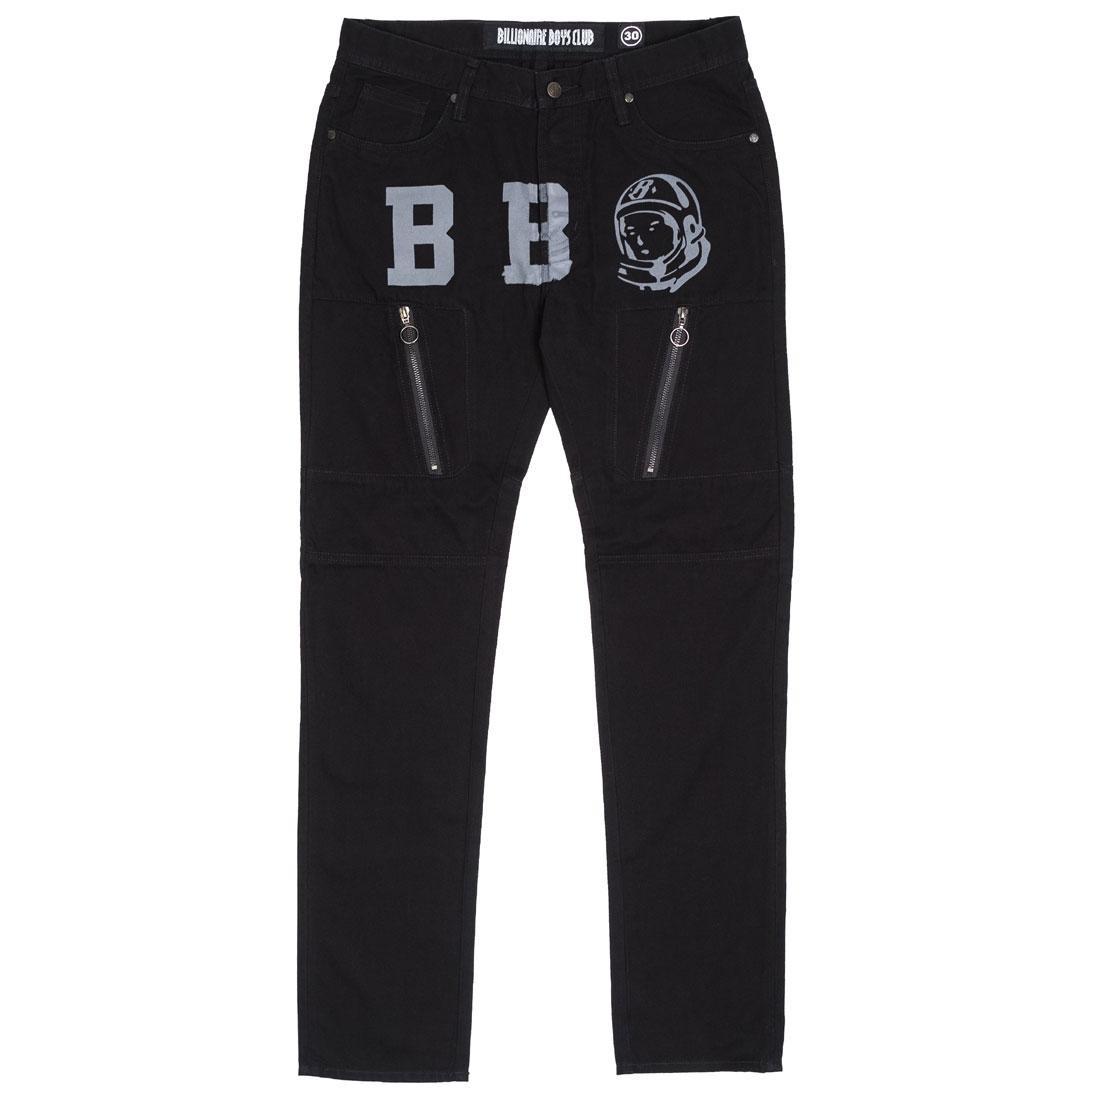 Billionaire Boys Club Men No Limits Pants (black)